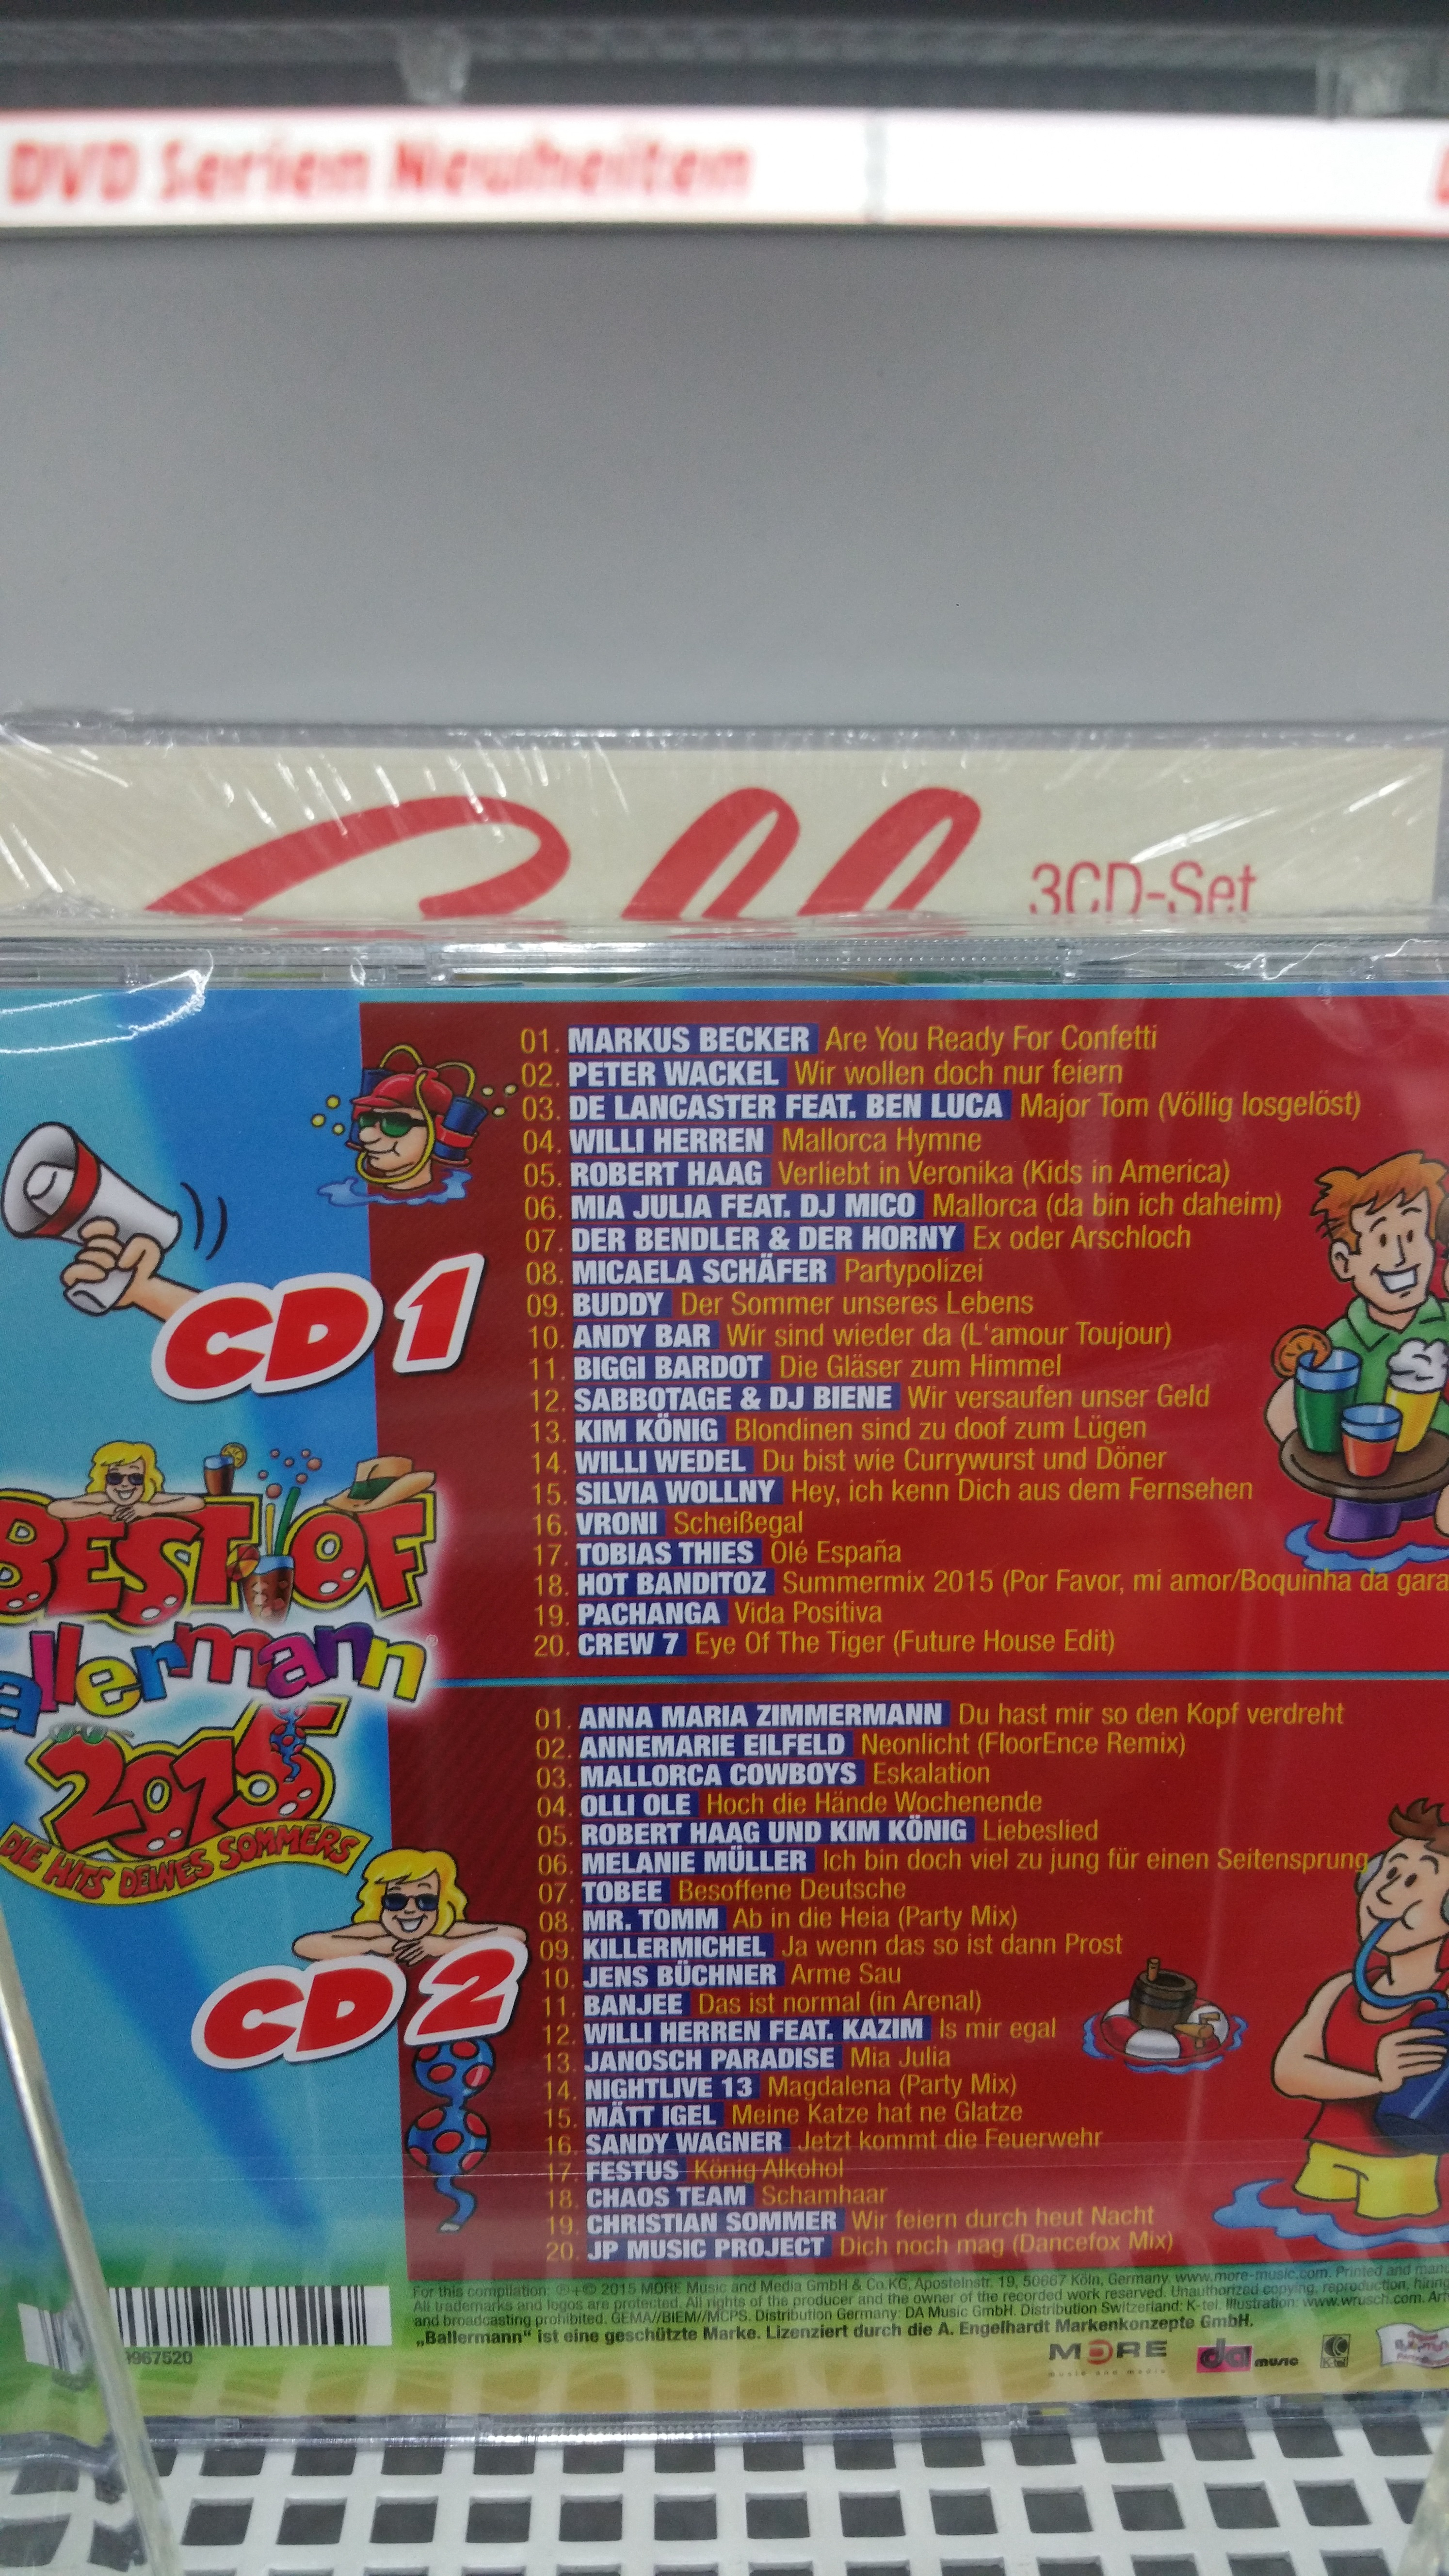 Ballermann CD